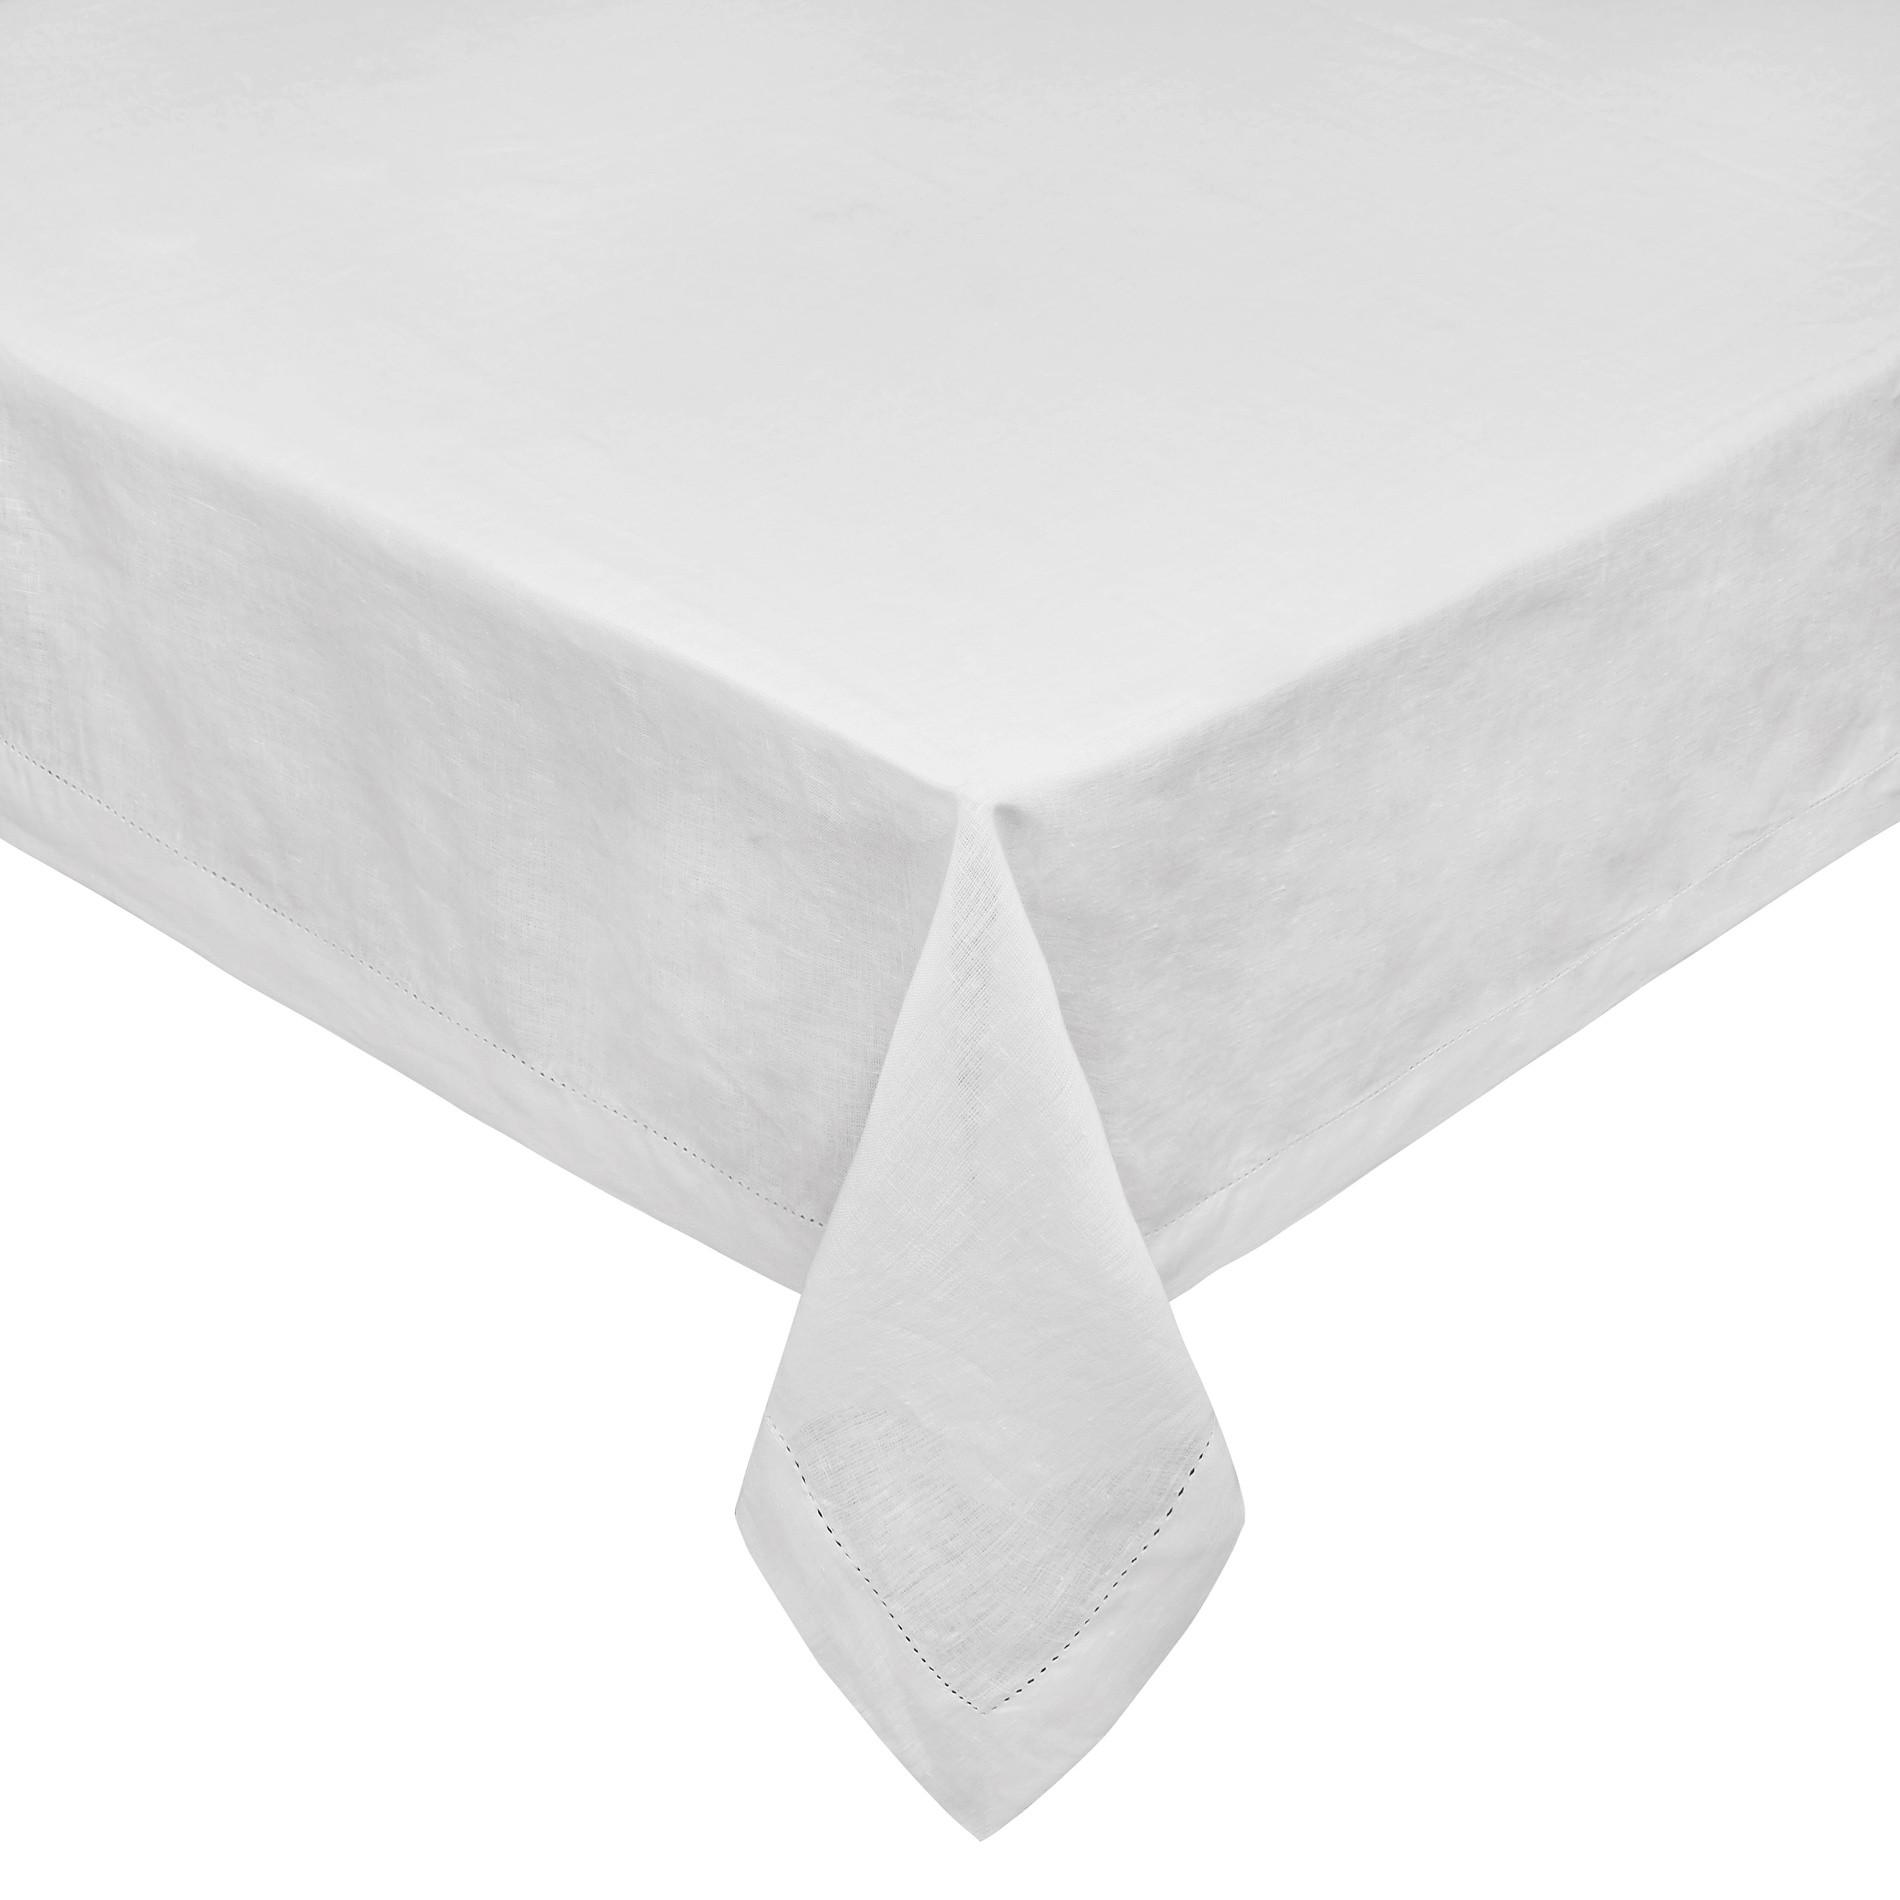 Tovaglia puro lino bordo a-jour, Bianco, large image number 0